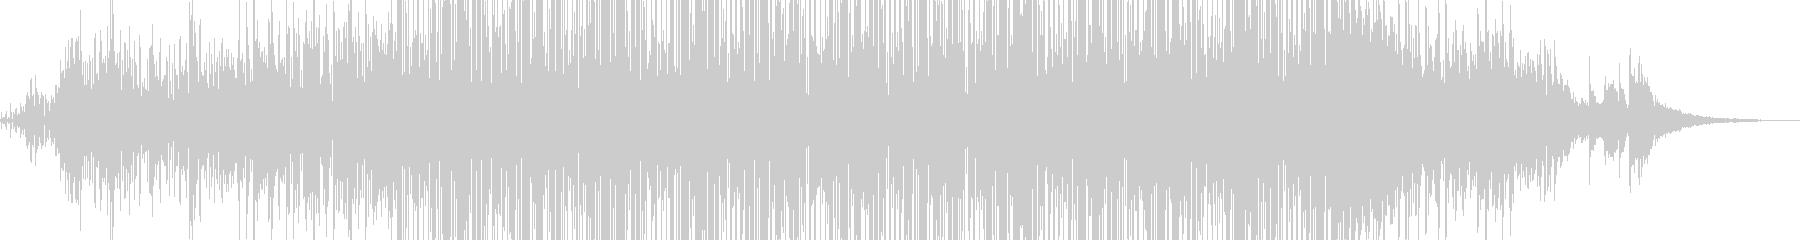 KANT無機質混沌BGM200611の未再生の波形